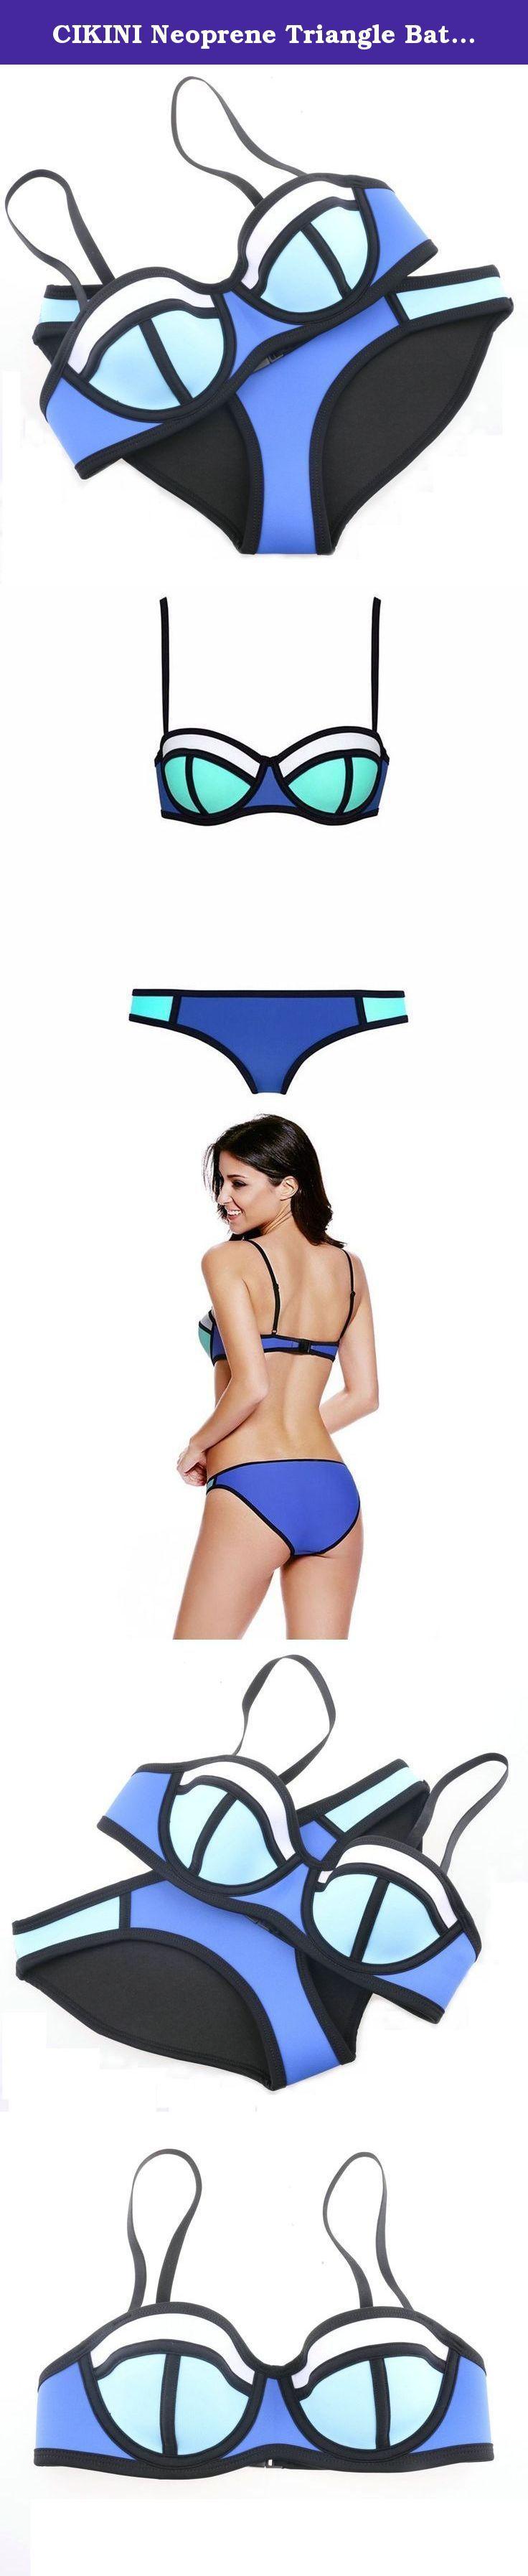 CIKINI Neoprene Triangle Bathing Swimwear Push Up bikini (XS(US0-2), Color 5). XS top : cup(A-B) . Bust/cup size Ref.(32A,32B,34A).Bust (75-83cm). XS bottom:85CM(83-87CM) S top : cup(B-C) . Bust/cup size Ref.(32C,34B,36B,36B ,38A).Bust (83-88cm). S bottom:90CM(87-92CM) M top : cup(C-D) . Bust/cup size Ref.(34C,34D,36C,38C).Bust (88-93cm). M bottom:95CM(92-97CM) L top : cup(D-DD) . Bust/cup size Ref.(36D,38D).Bust (93-99cm). L bottom:100CM(97-103CM) XL top : cup(DD-E) . Bust/cup size...